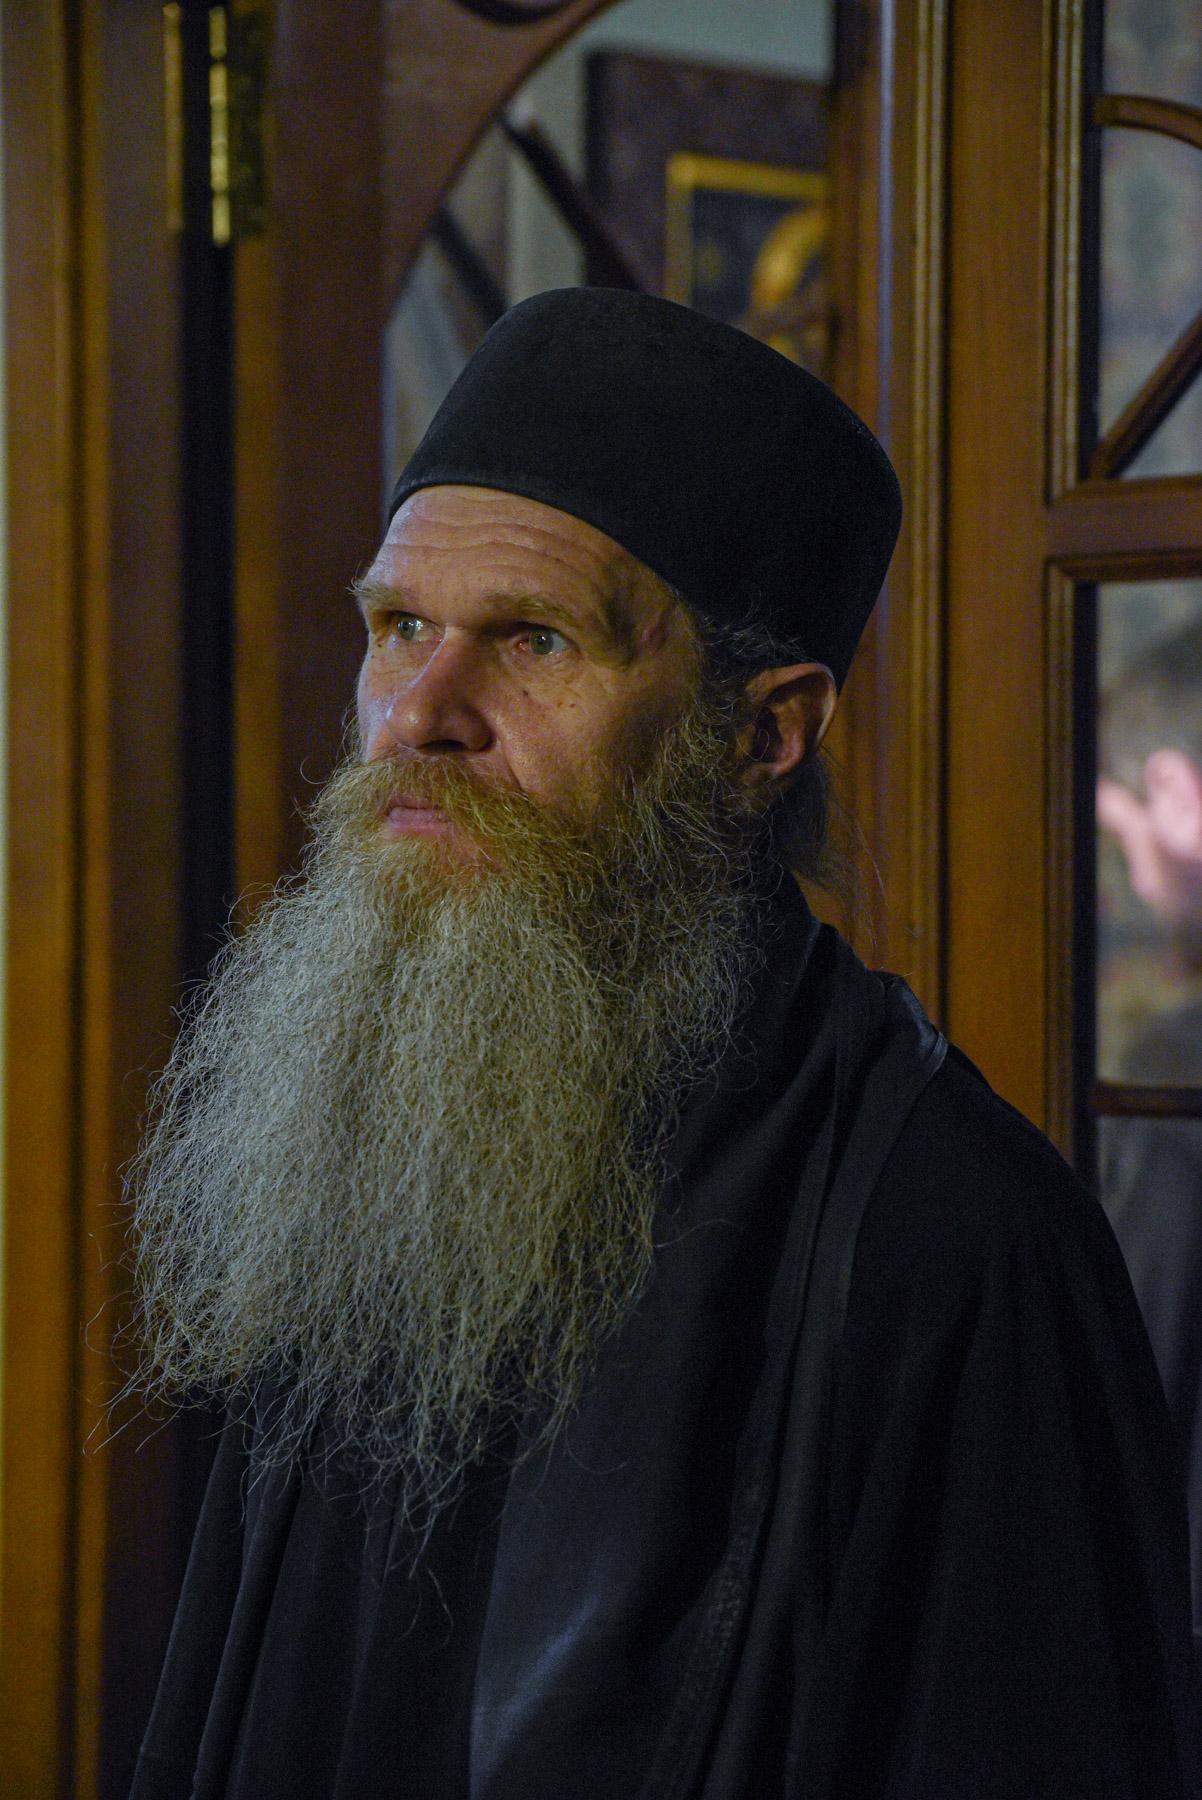 photos of orthodox christmas 0146 2